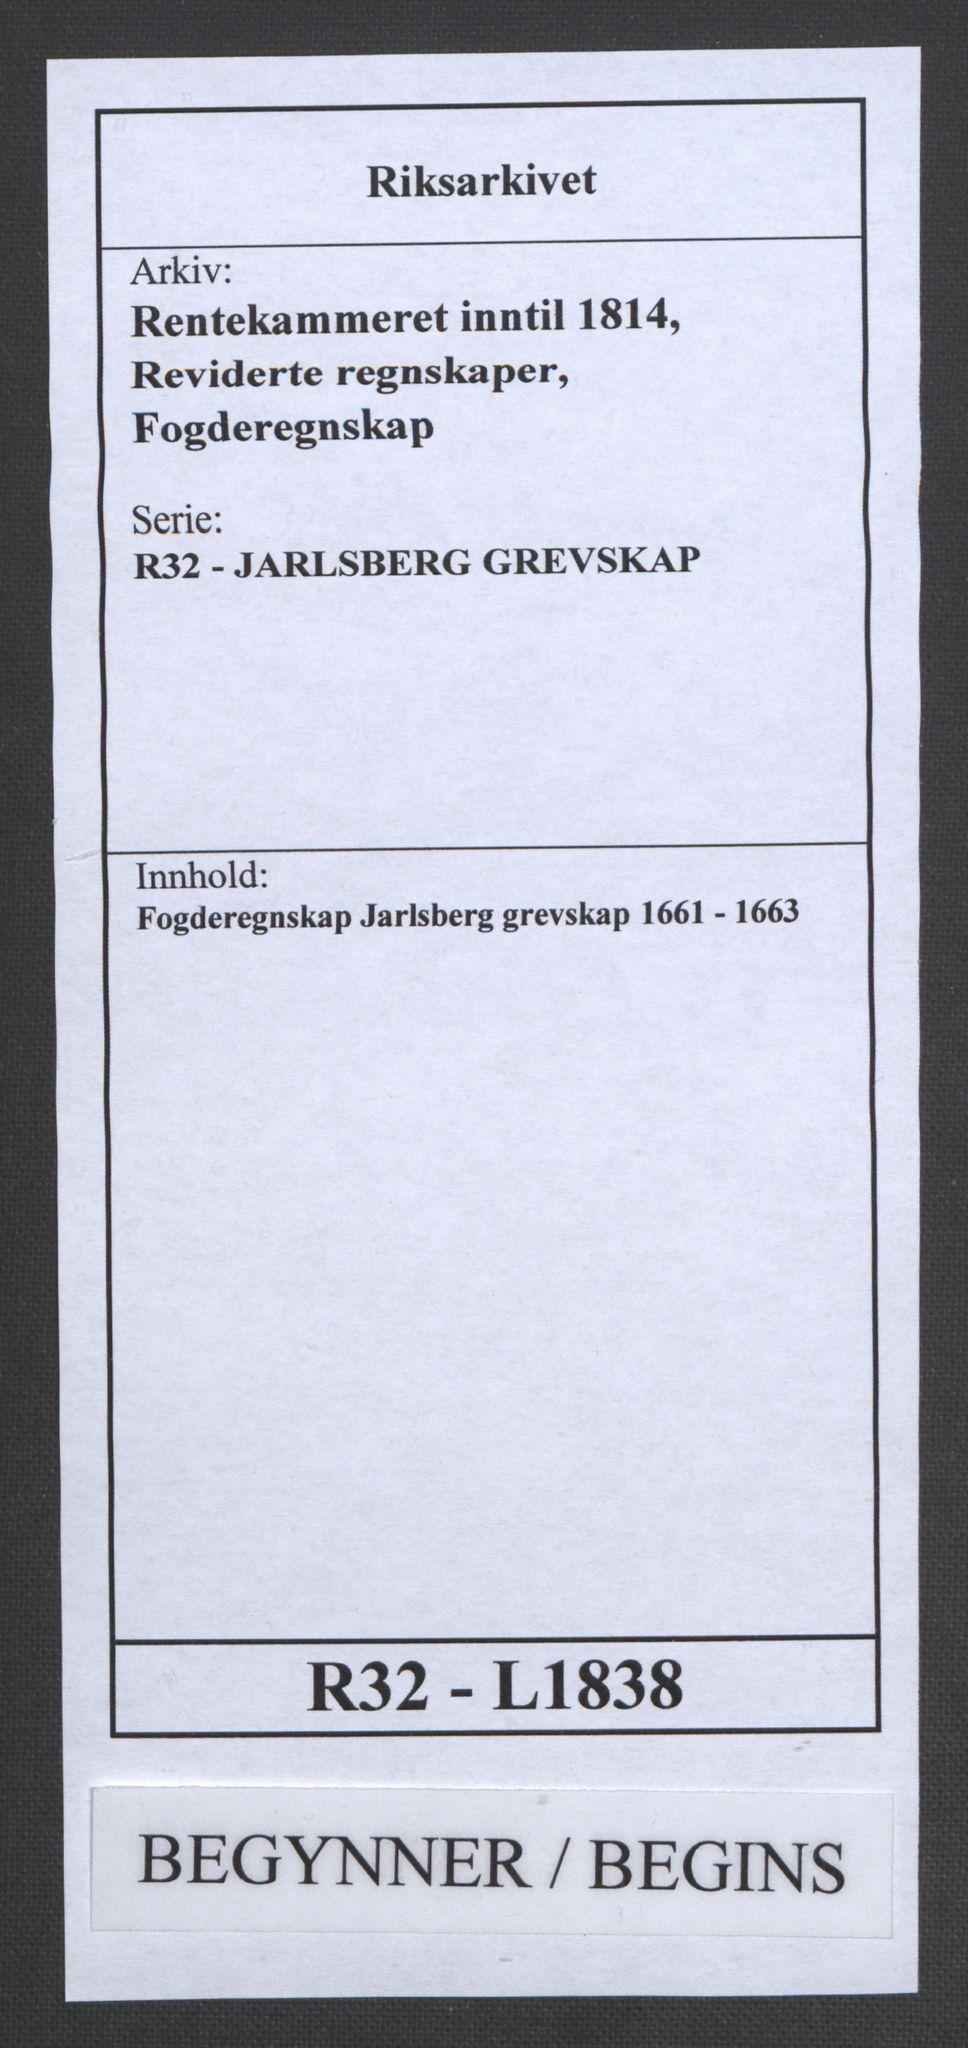 RA, Rentekammeret inntil 1814, Reviderte regnskaper, Fogderegnskap, R32/L1838: Fogderegnskap Jarlsberg grevskap, 1661-1663, s. 1